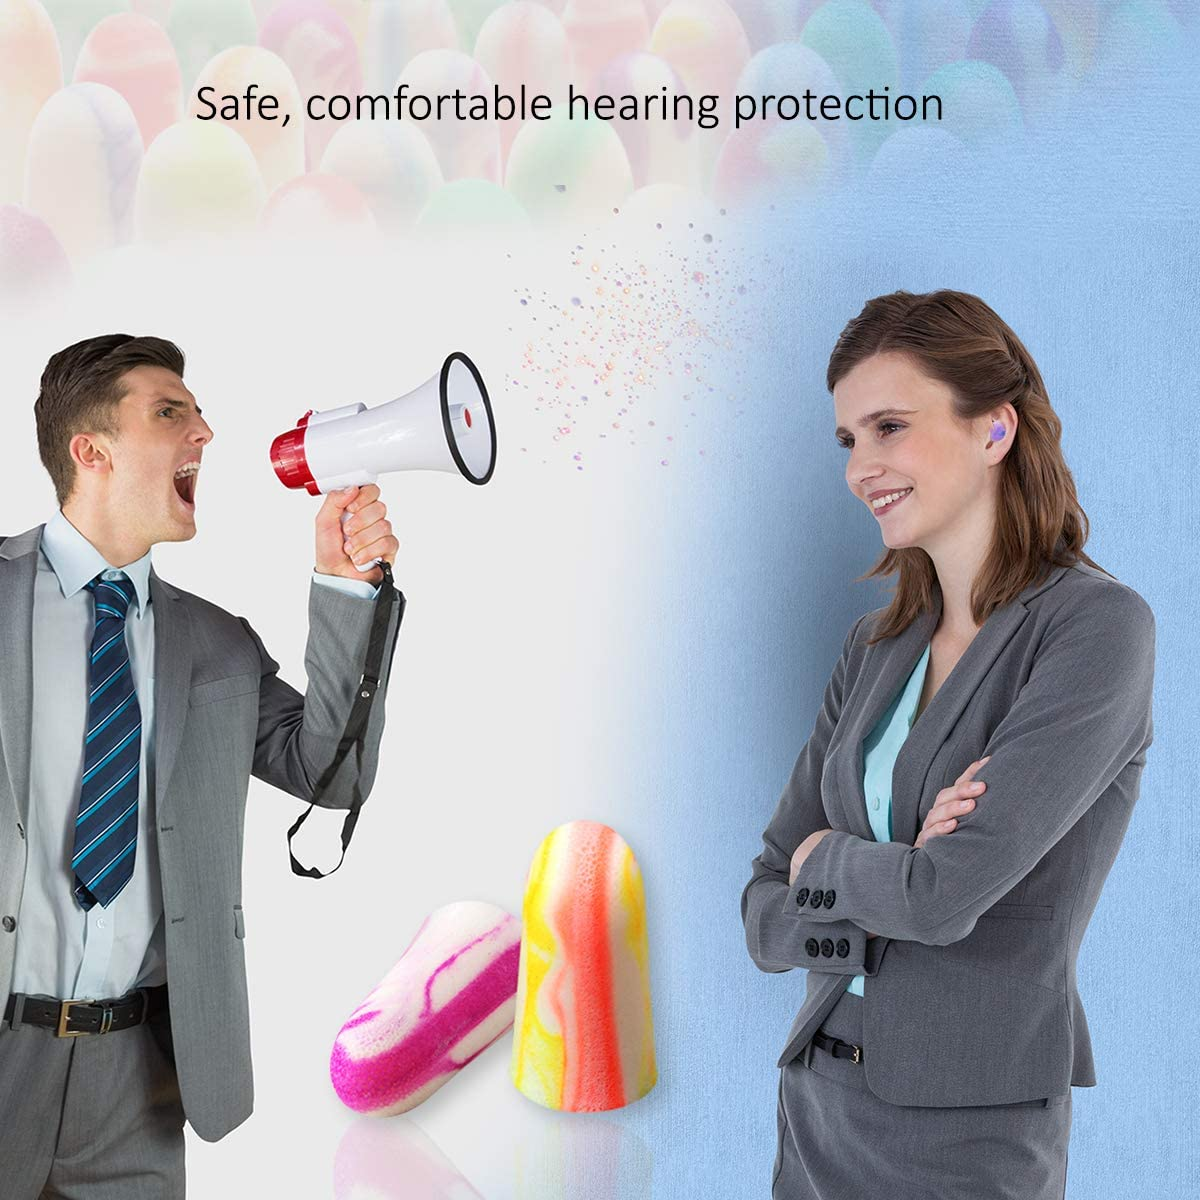 33dB Highest NRR Made MOLDEX Sparkplugs Soft Foam Ear Plugs 50 Pairs Earplugs